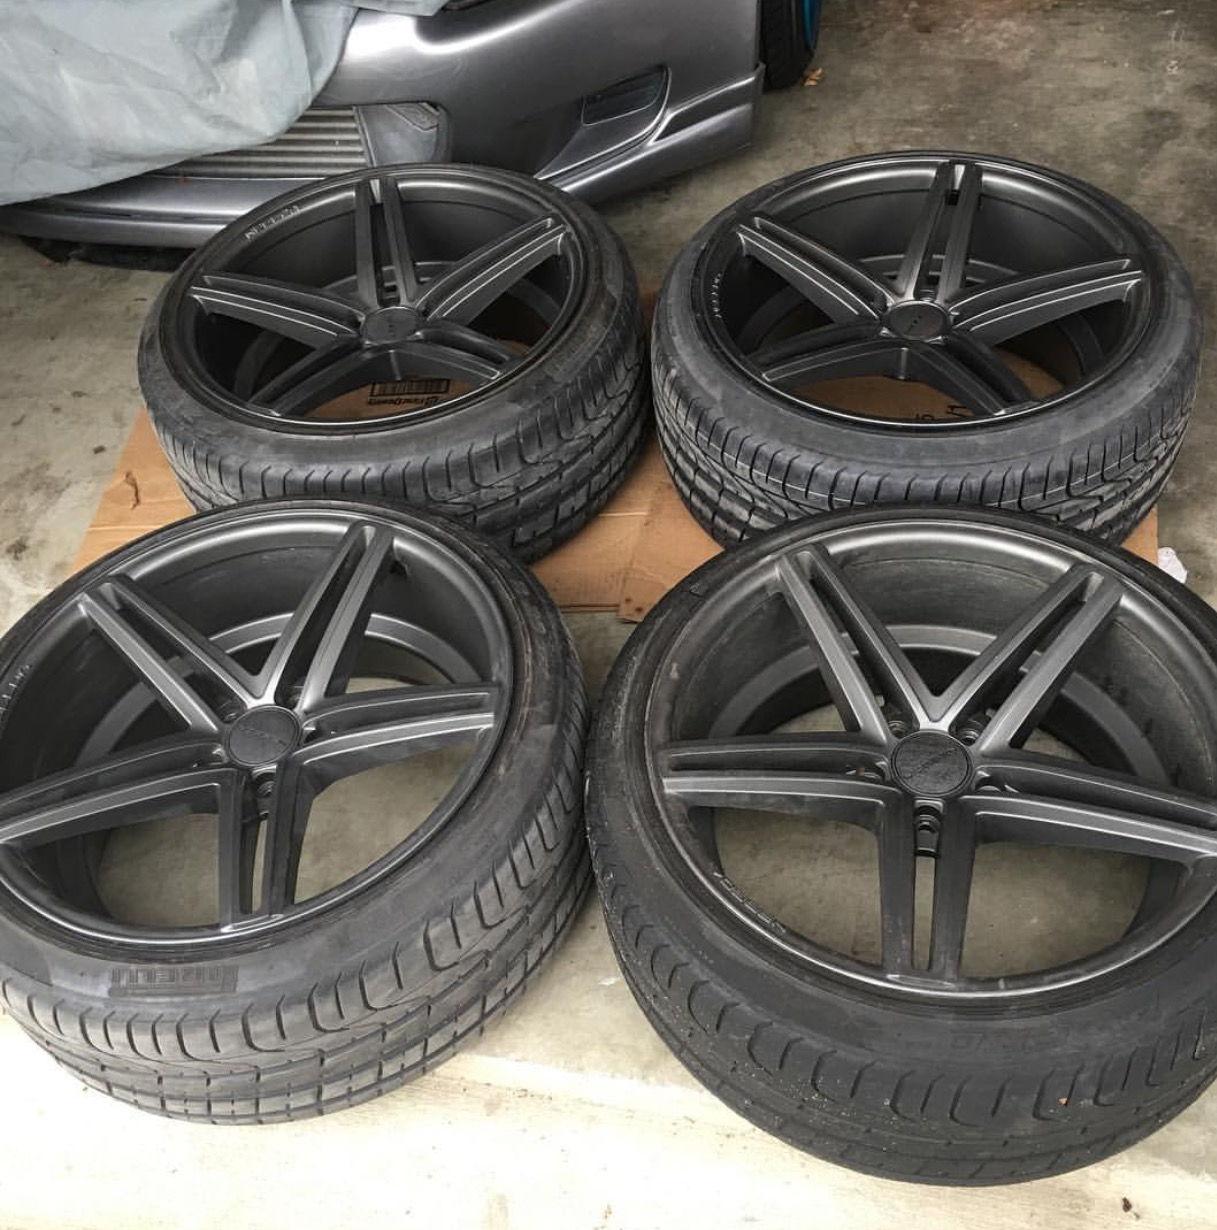 FS: Vossen CV5 20x10.5+45mm 5x120 Tires Are 255/35/20